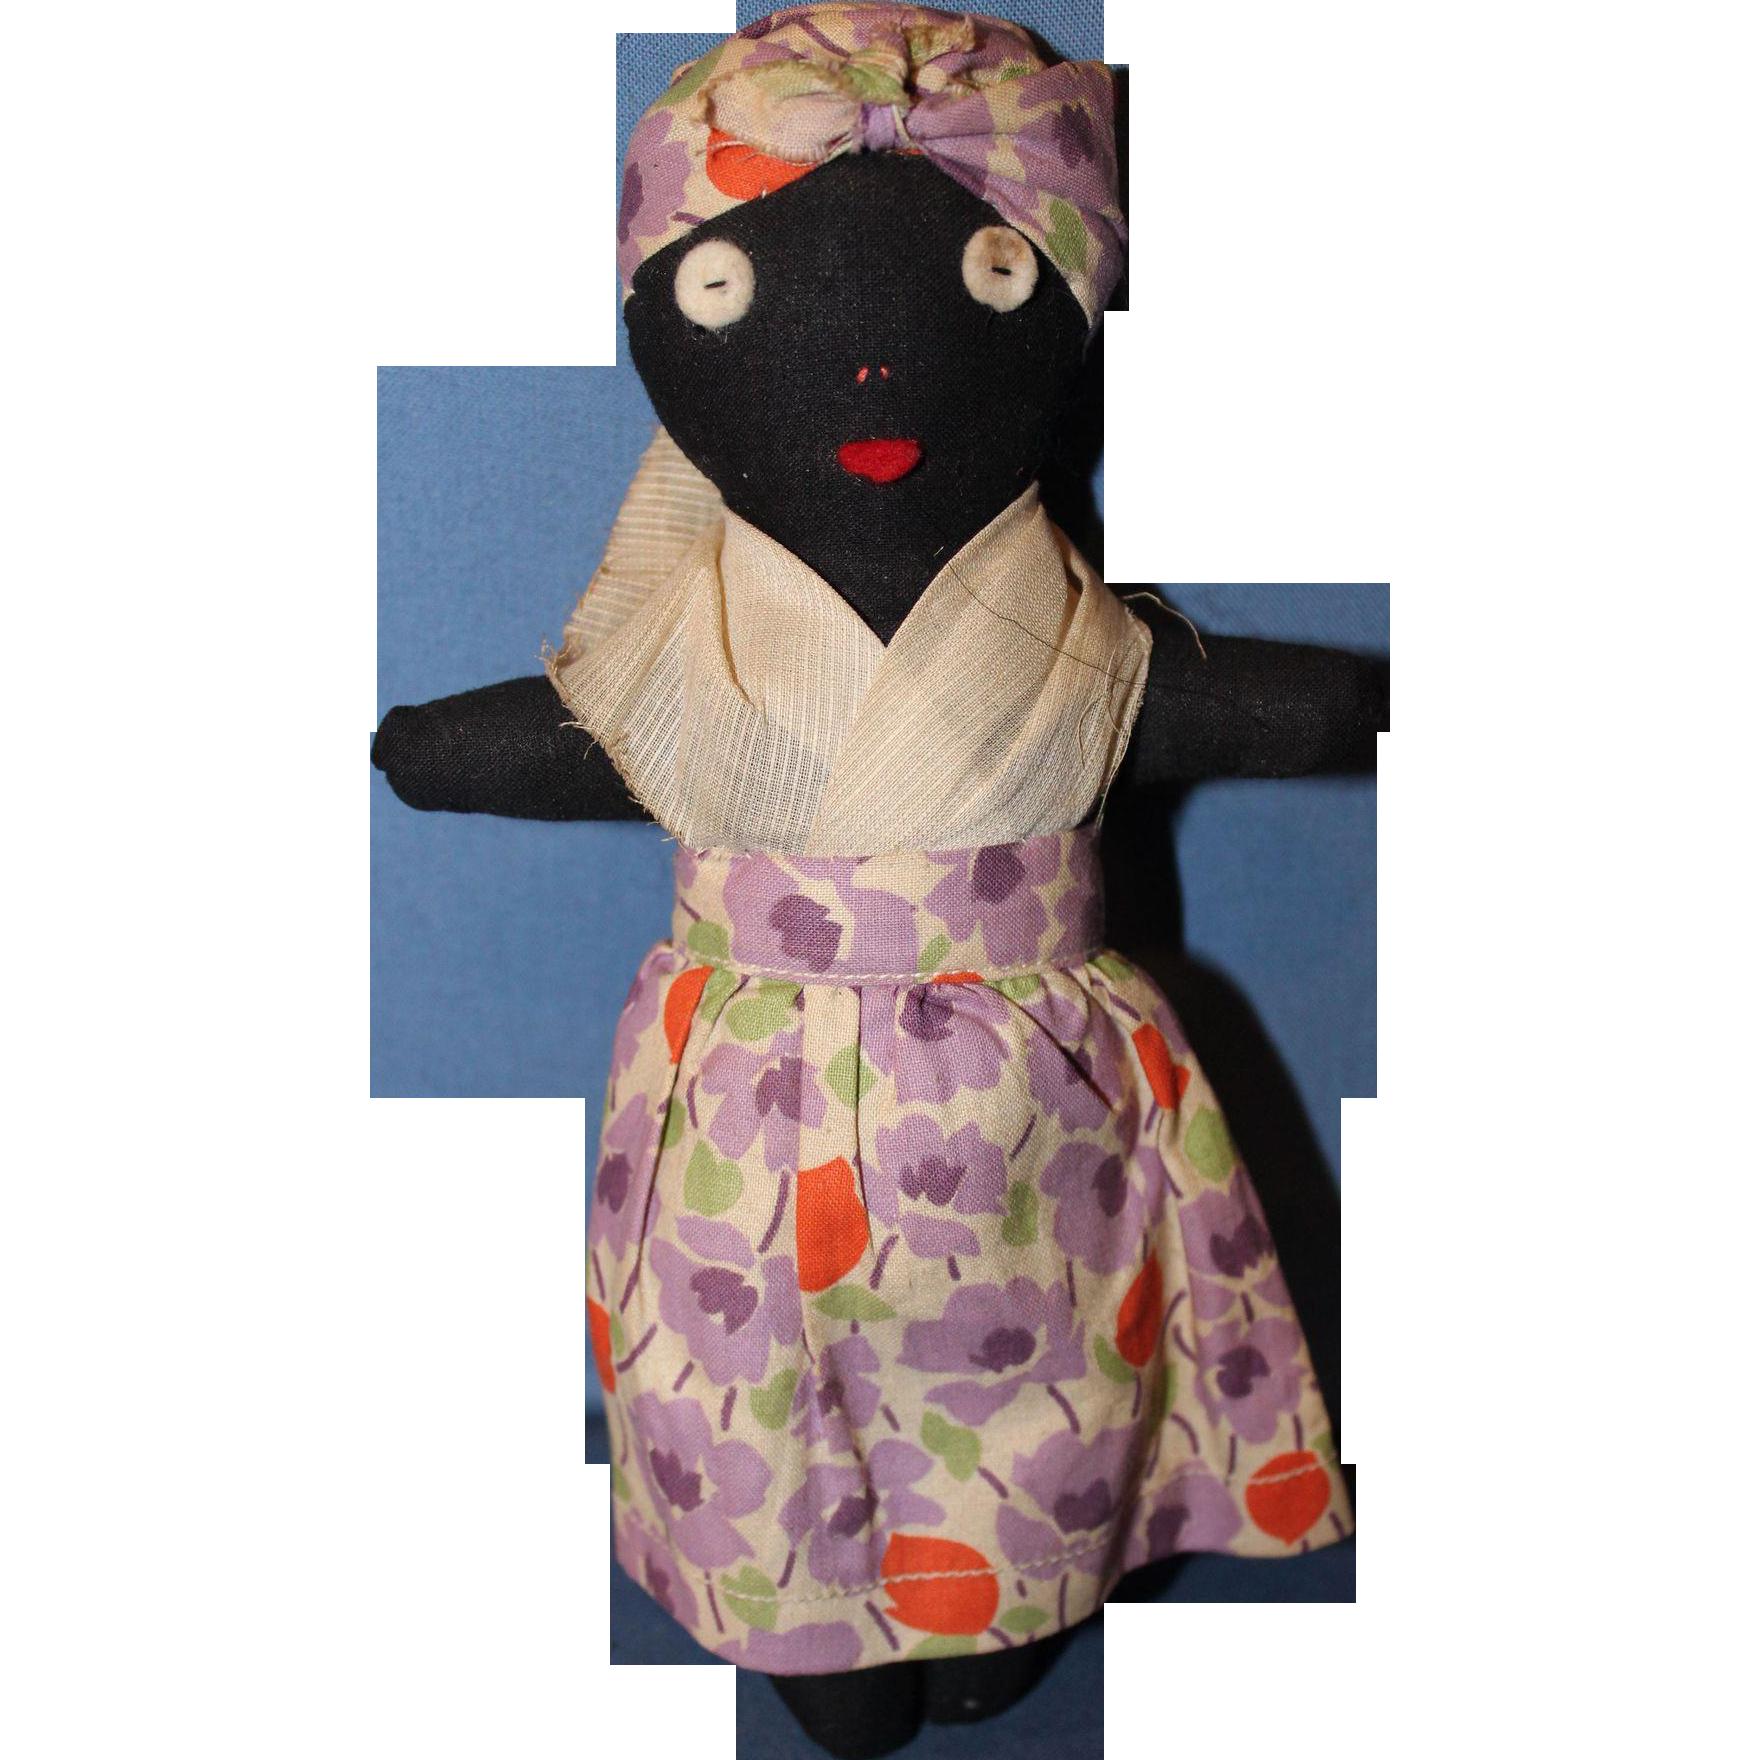 Small Black Doll